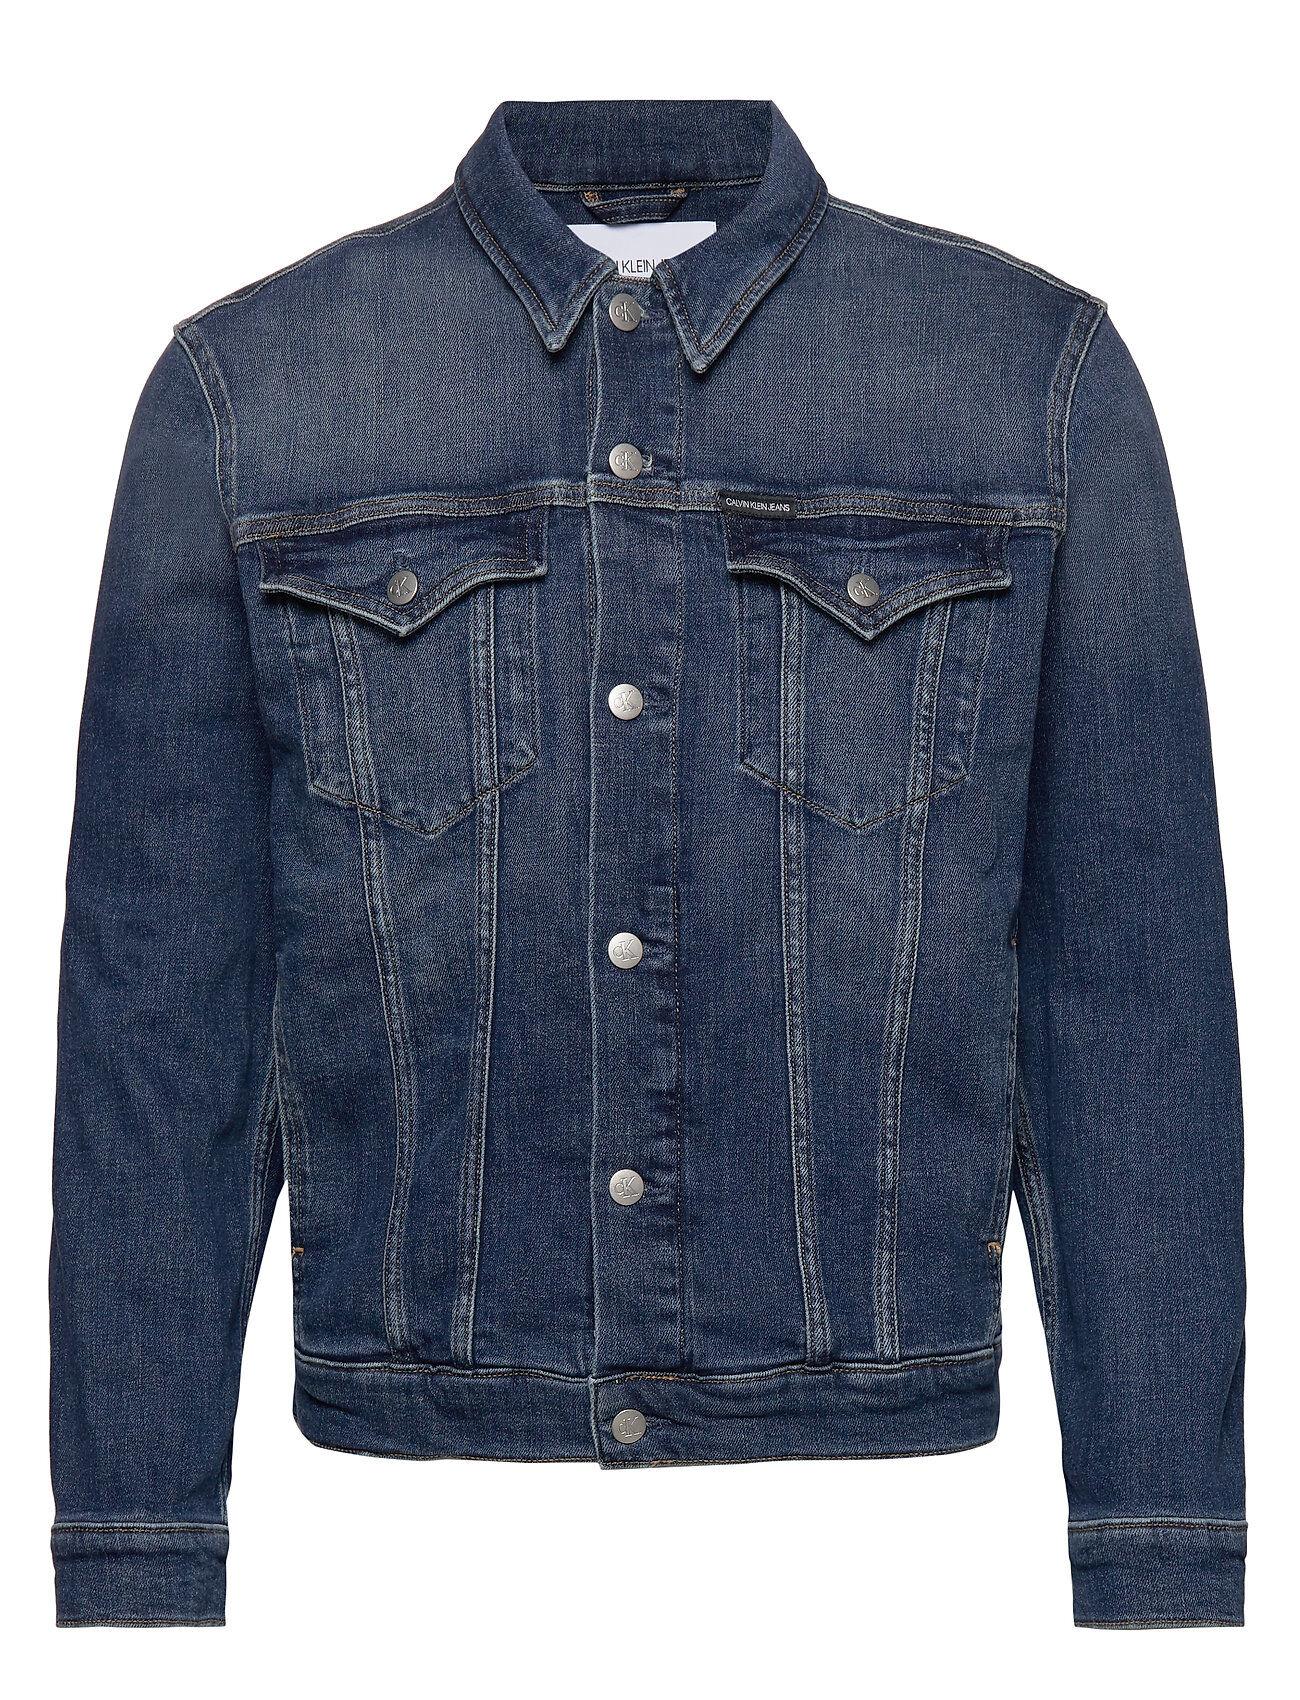 Image of Calvin Foundation Slim Denim Jacket Farkkutakki Denimtakki Sininen Calvin Klein Jeans